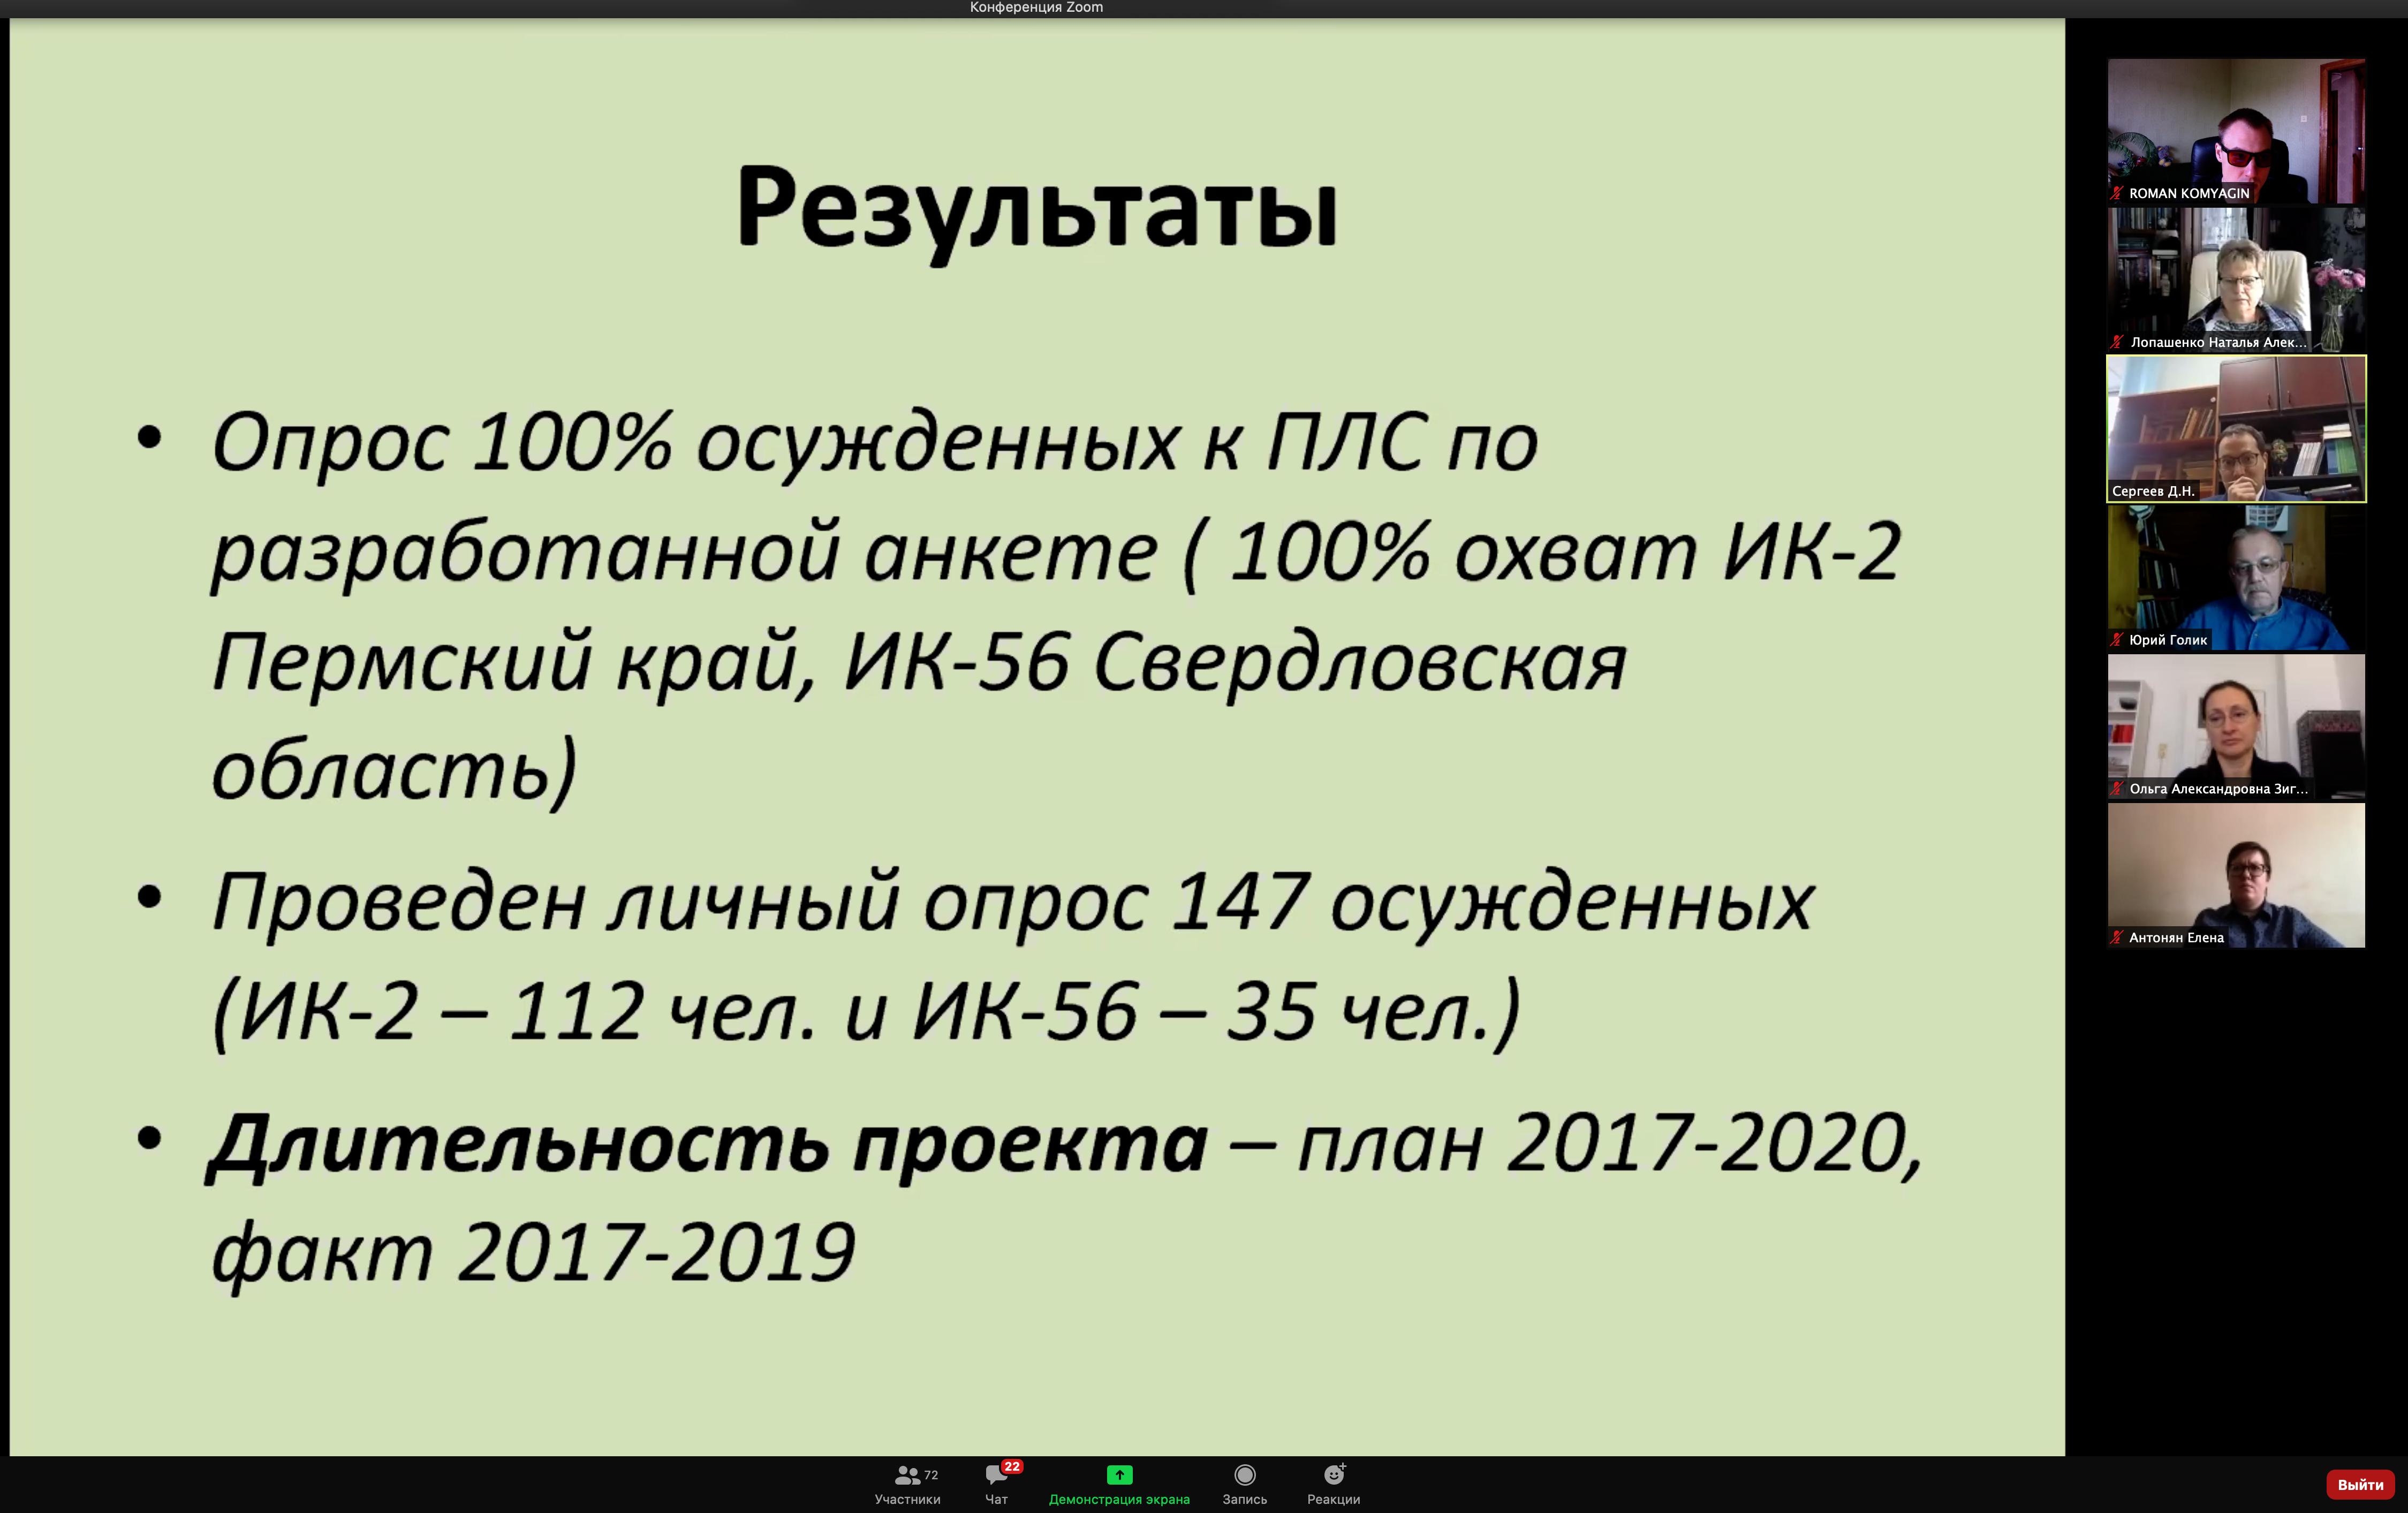 Снимок экрана 2020-09-24 в 16.33.05